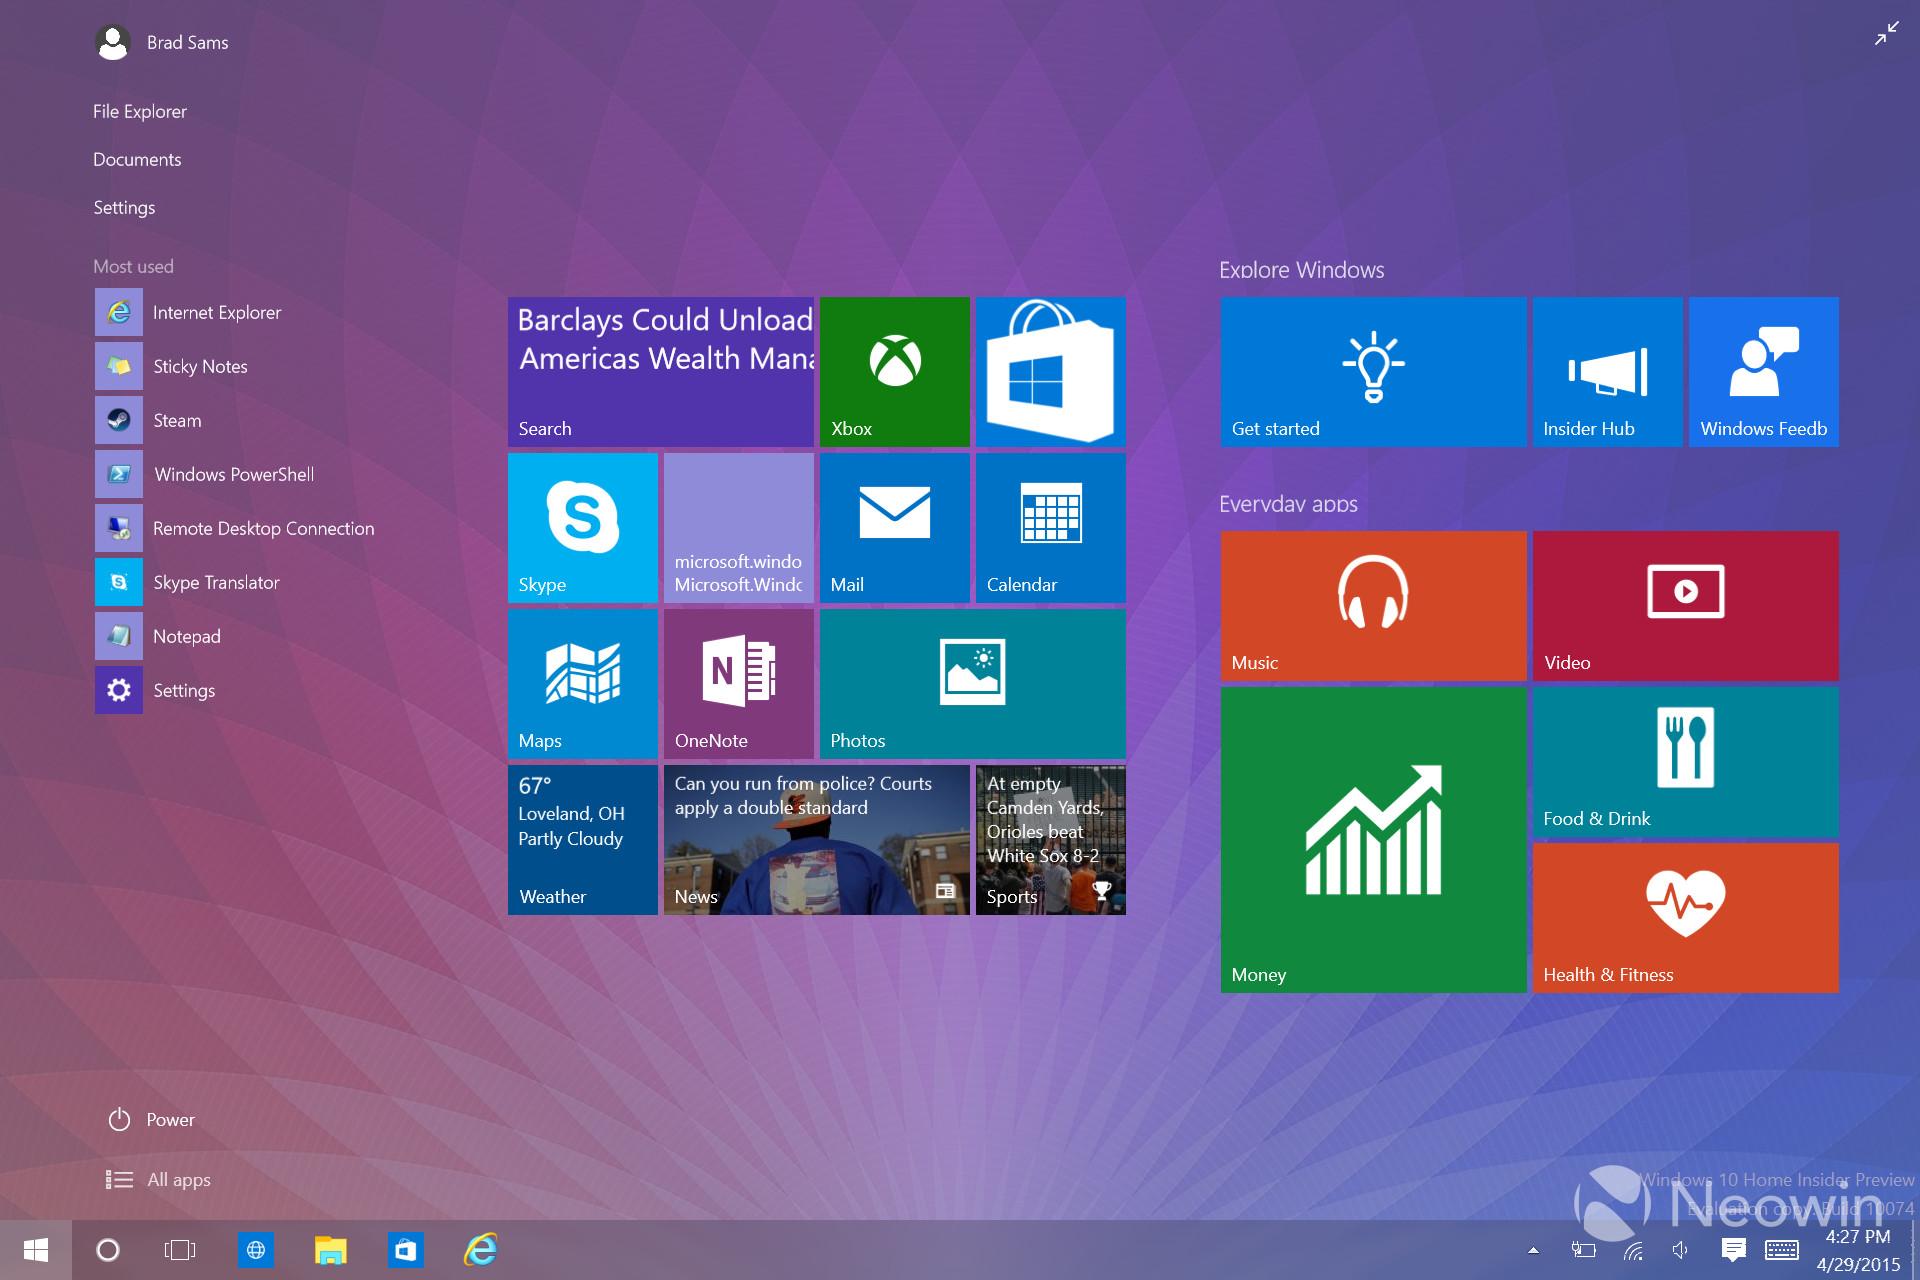 Pubg Windows 10 Theme: Gallery: Windows 10 Insider Preview Build 10074